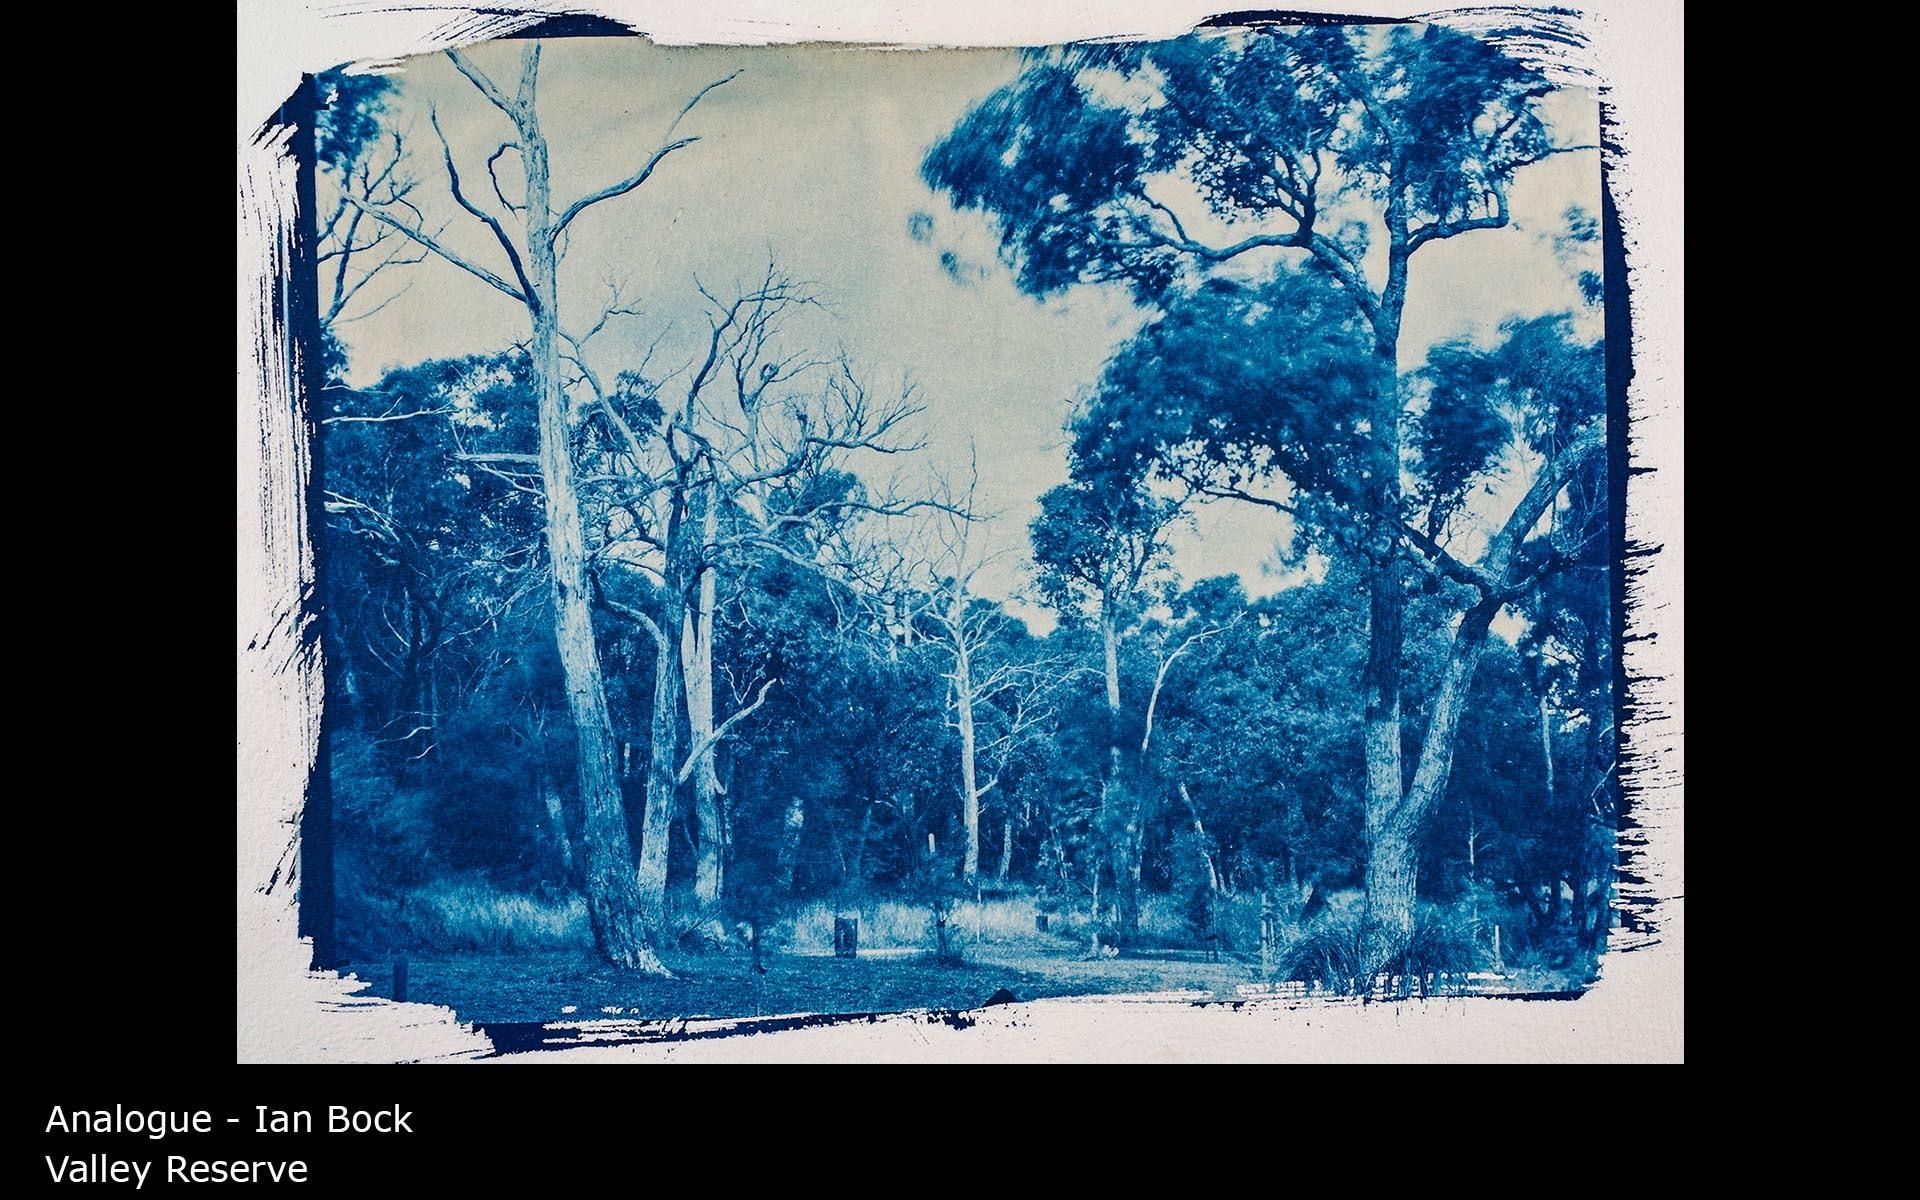 Valley Reserve - Ian Bock